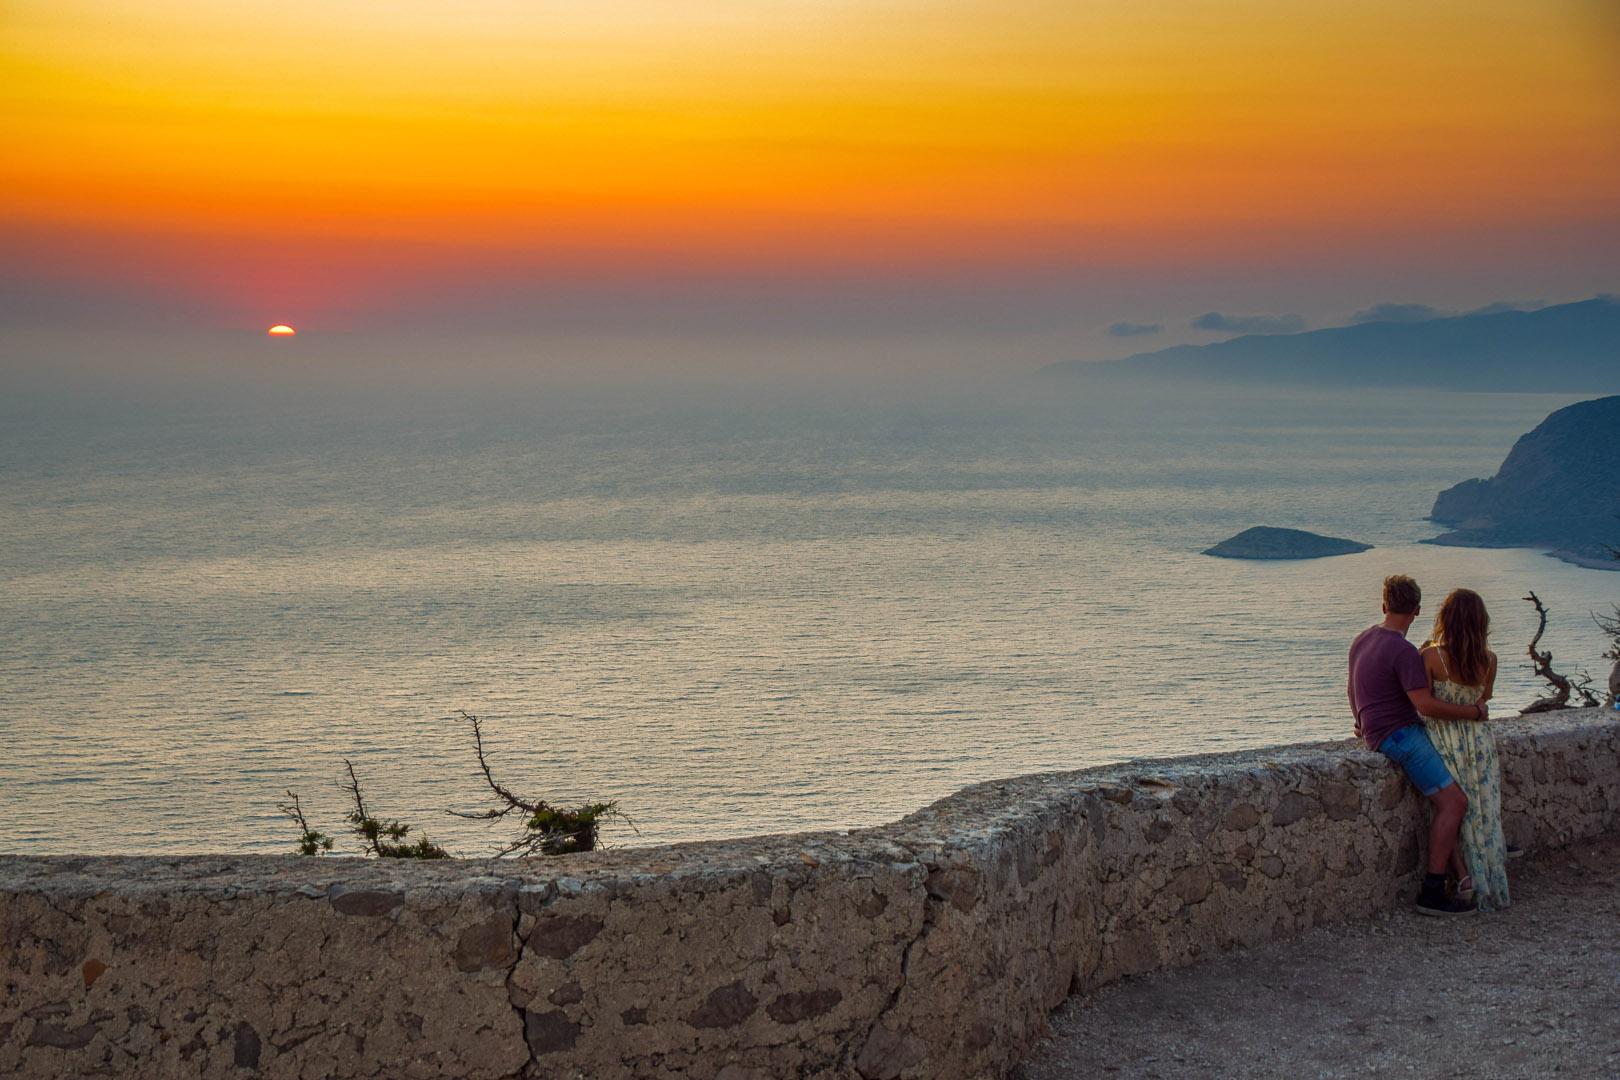 romantic sunset in Monolithos after wine tasting in Ebonas